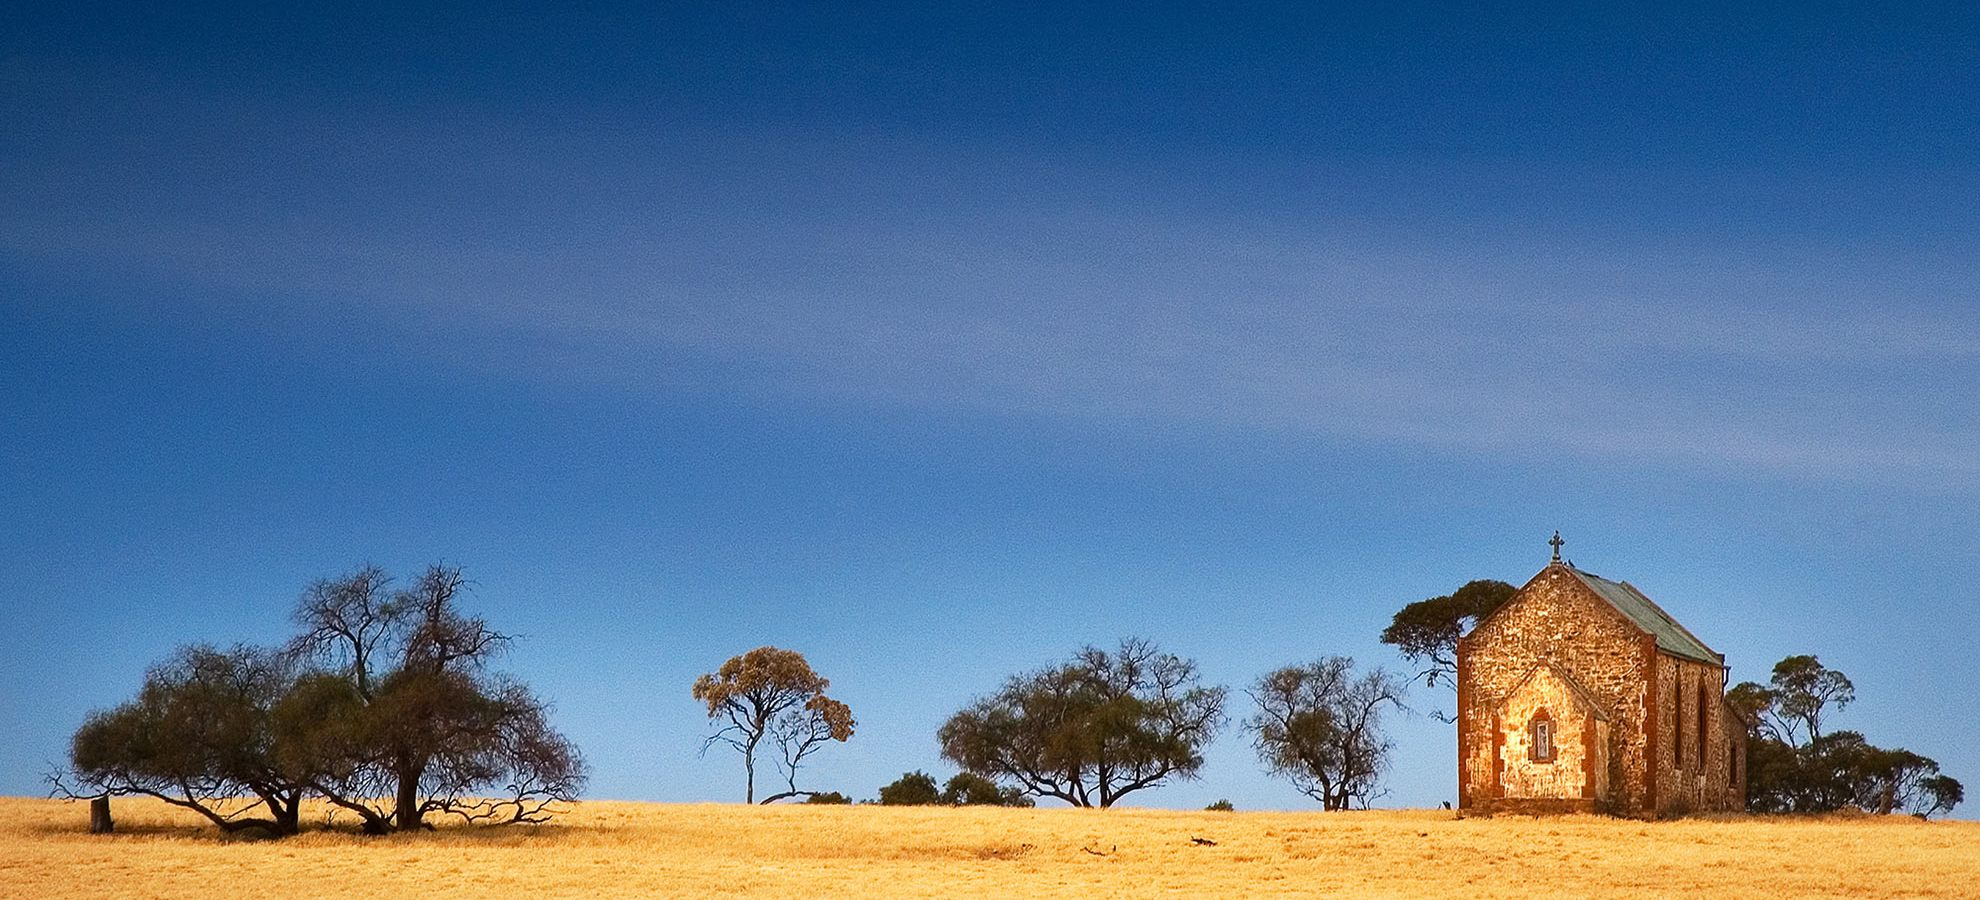 A Catholic Chapel in Outback Australia 02